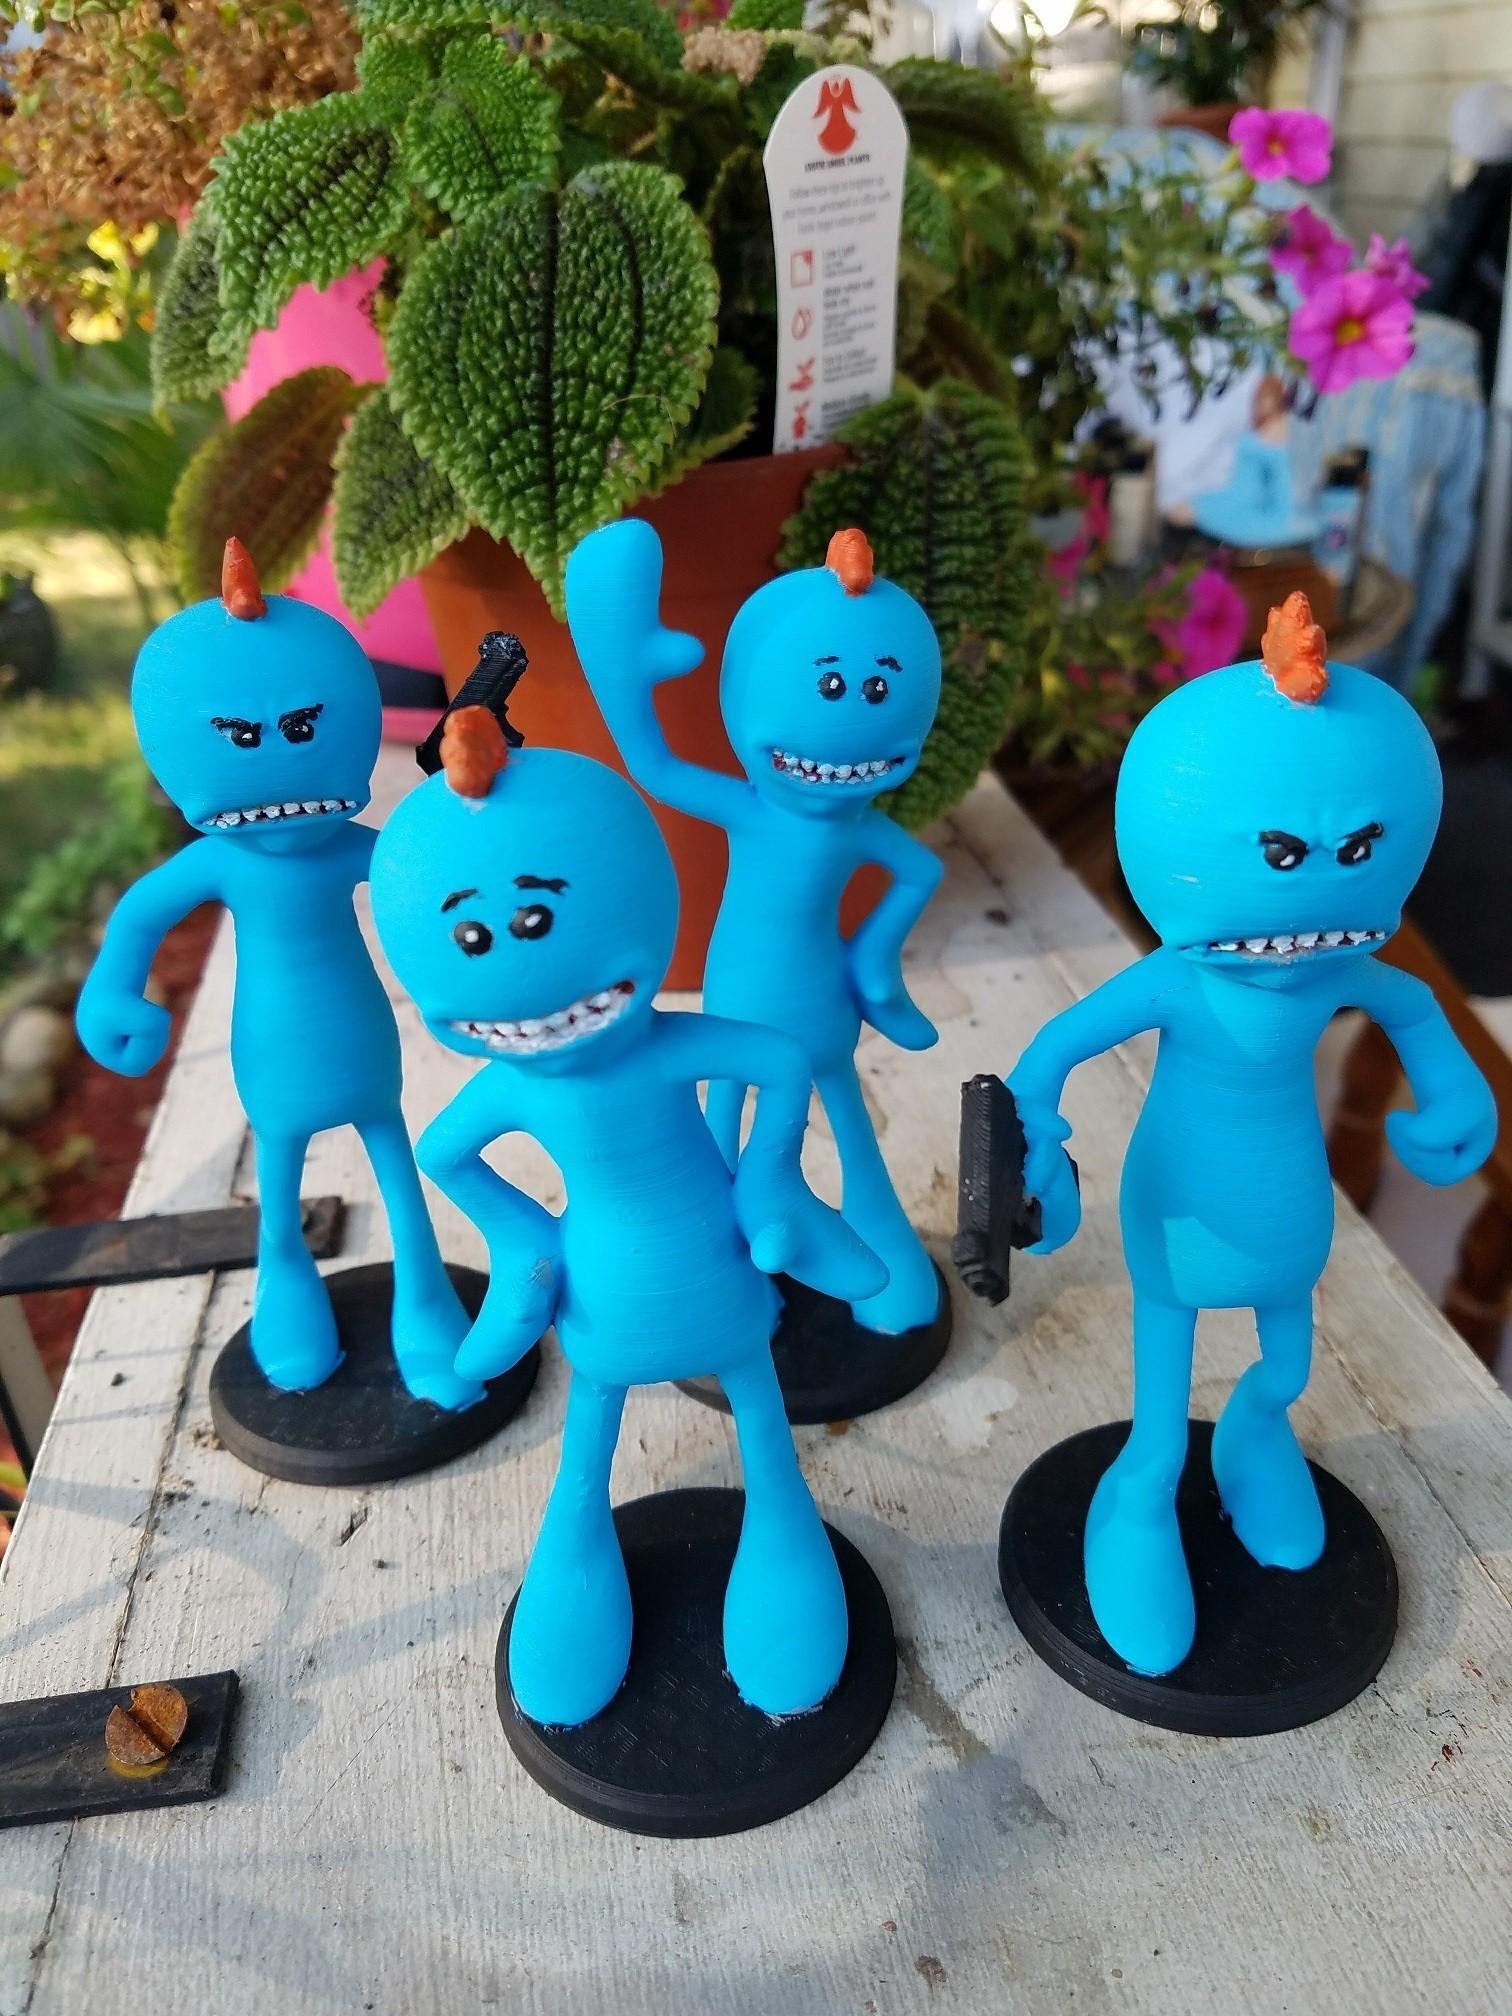 20170815_183518.jpg Download free STL file Rick and Morty assortment of Mr. Meeseeks • 3D printable model, Anthrobones